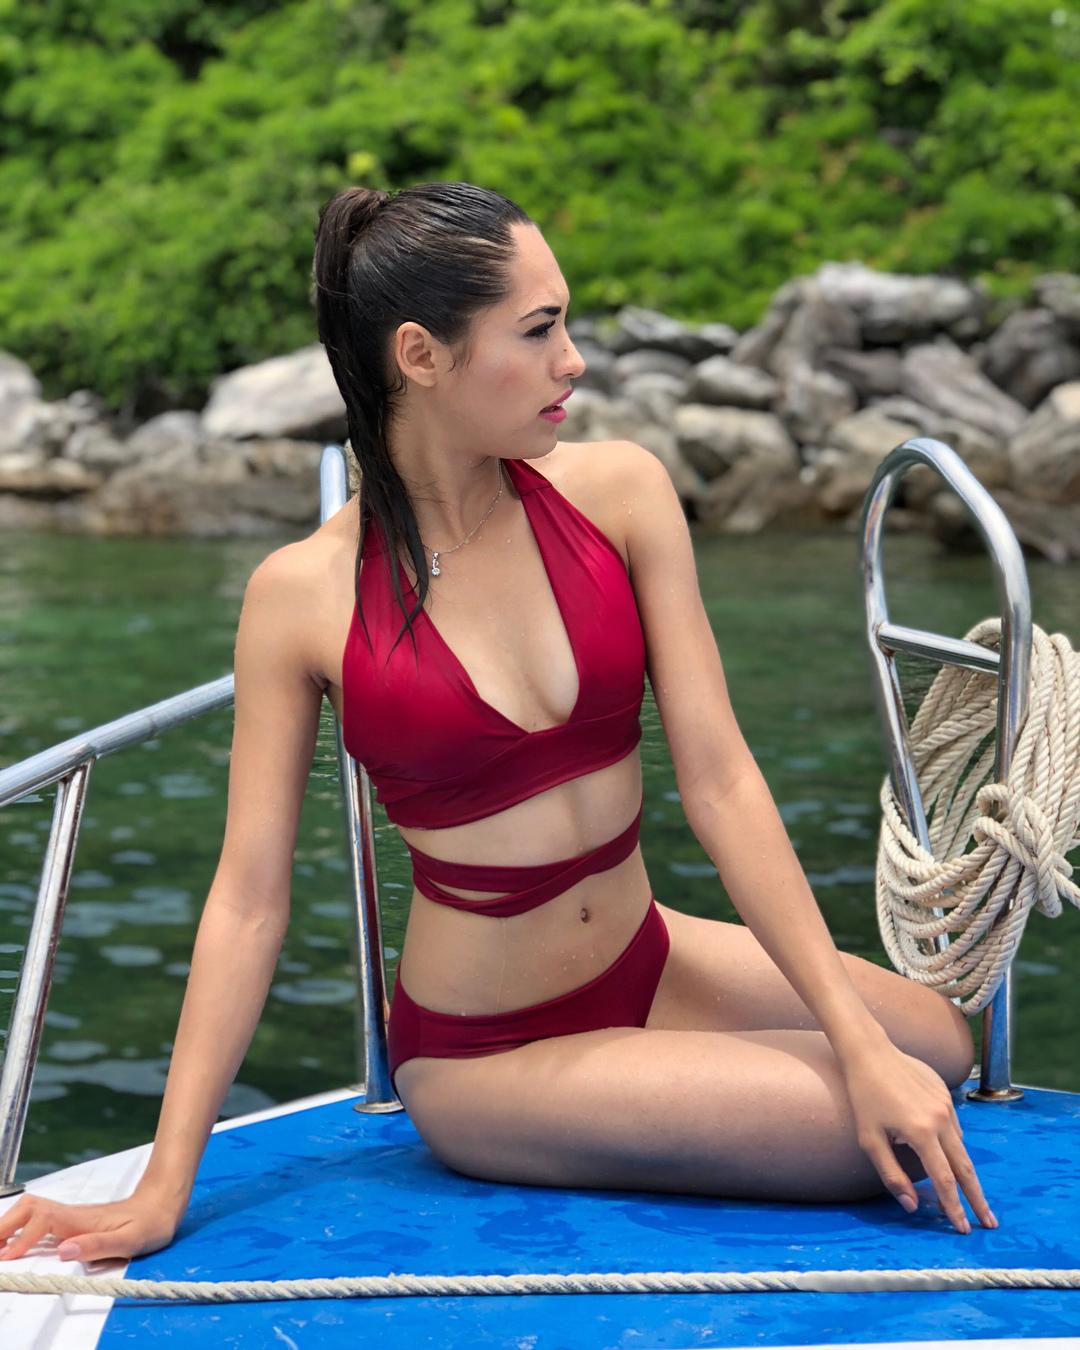 joely oralia garcia navarro, world miss tourism mexico 2018/miss globe mexico 2017. - Página 2 37217310